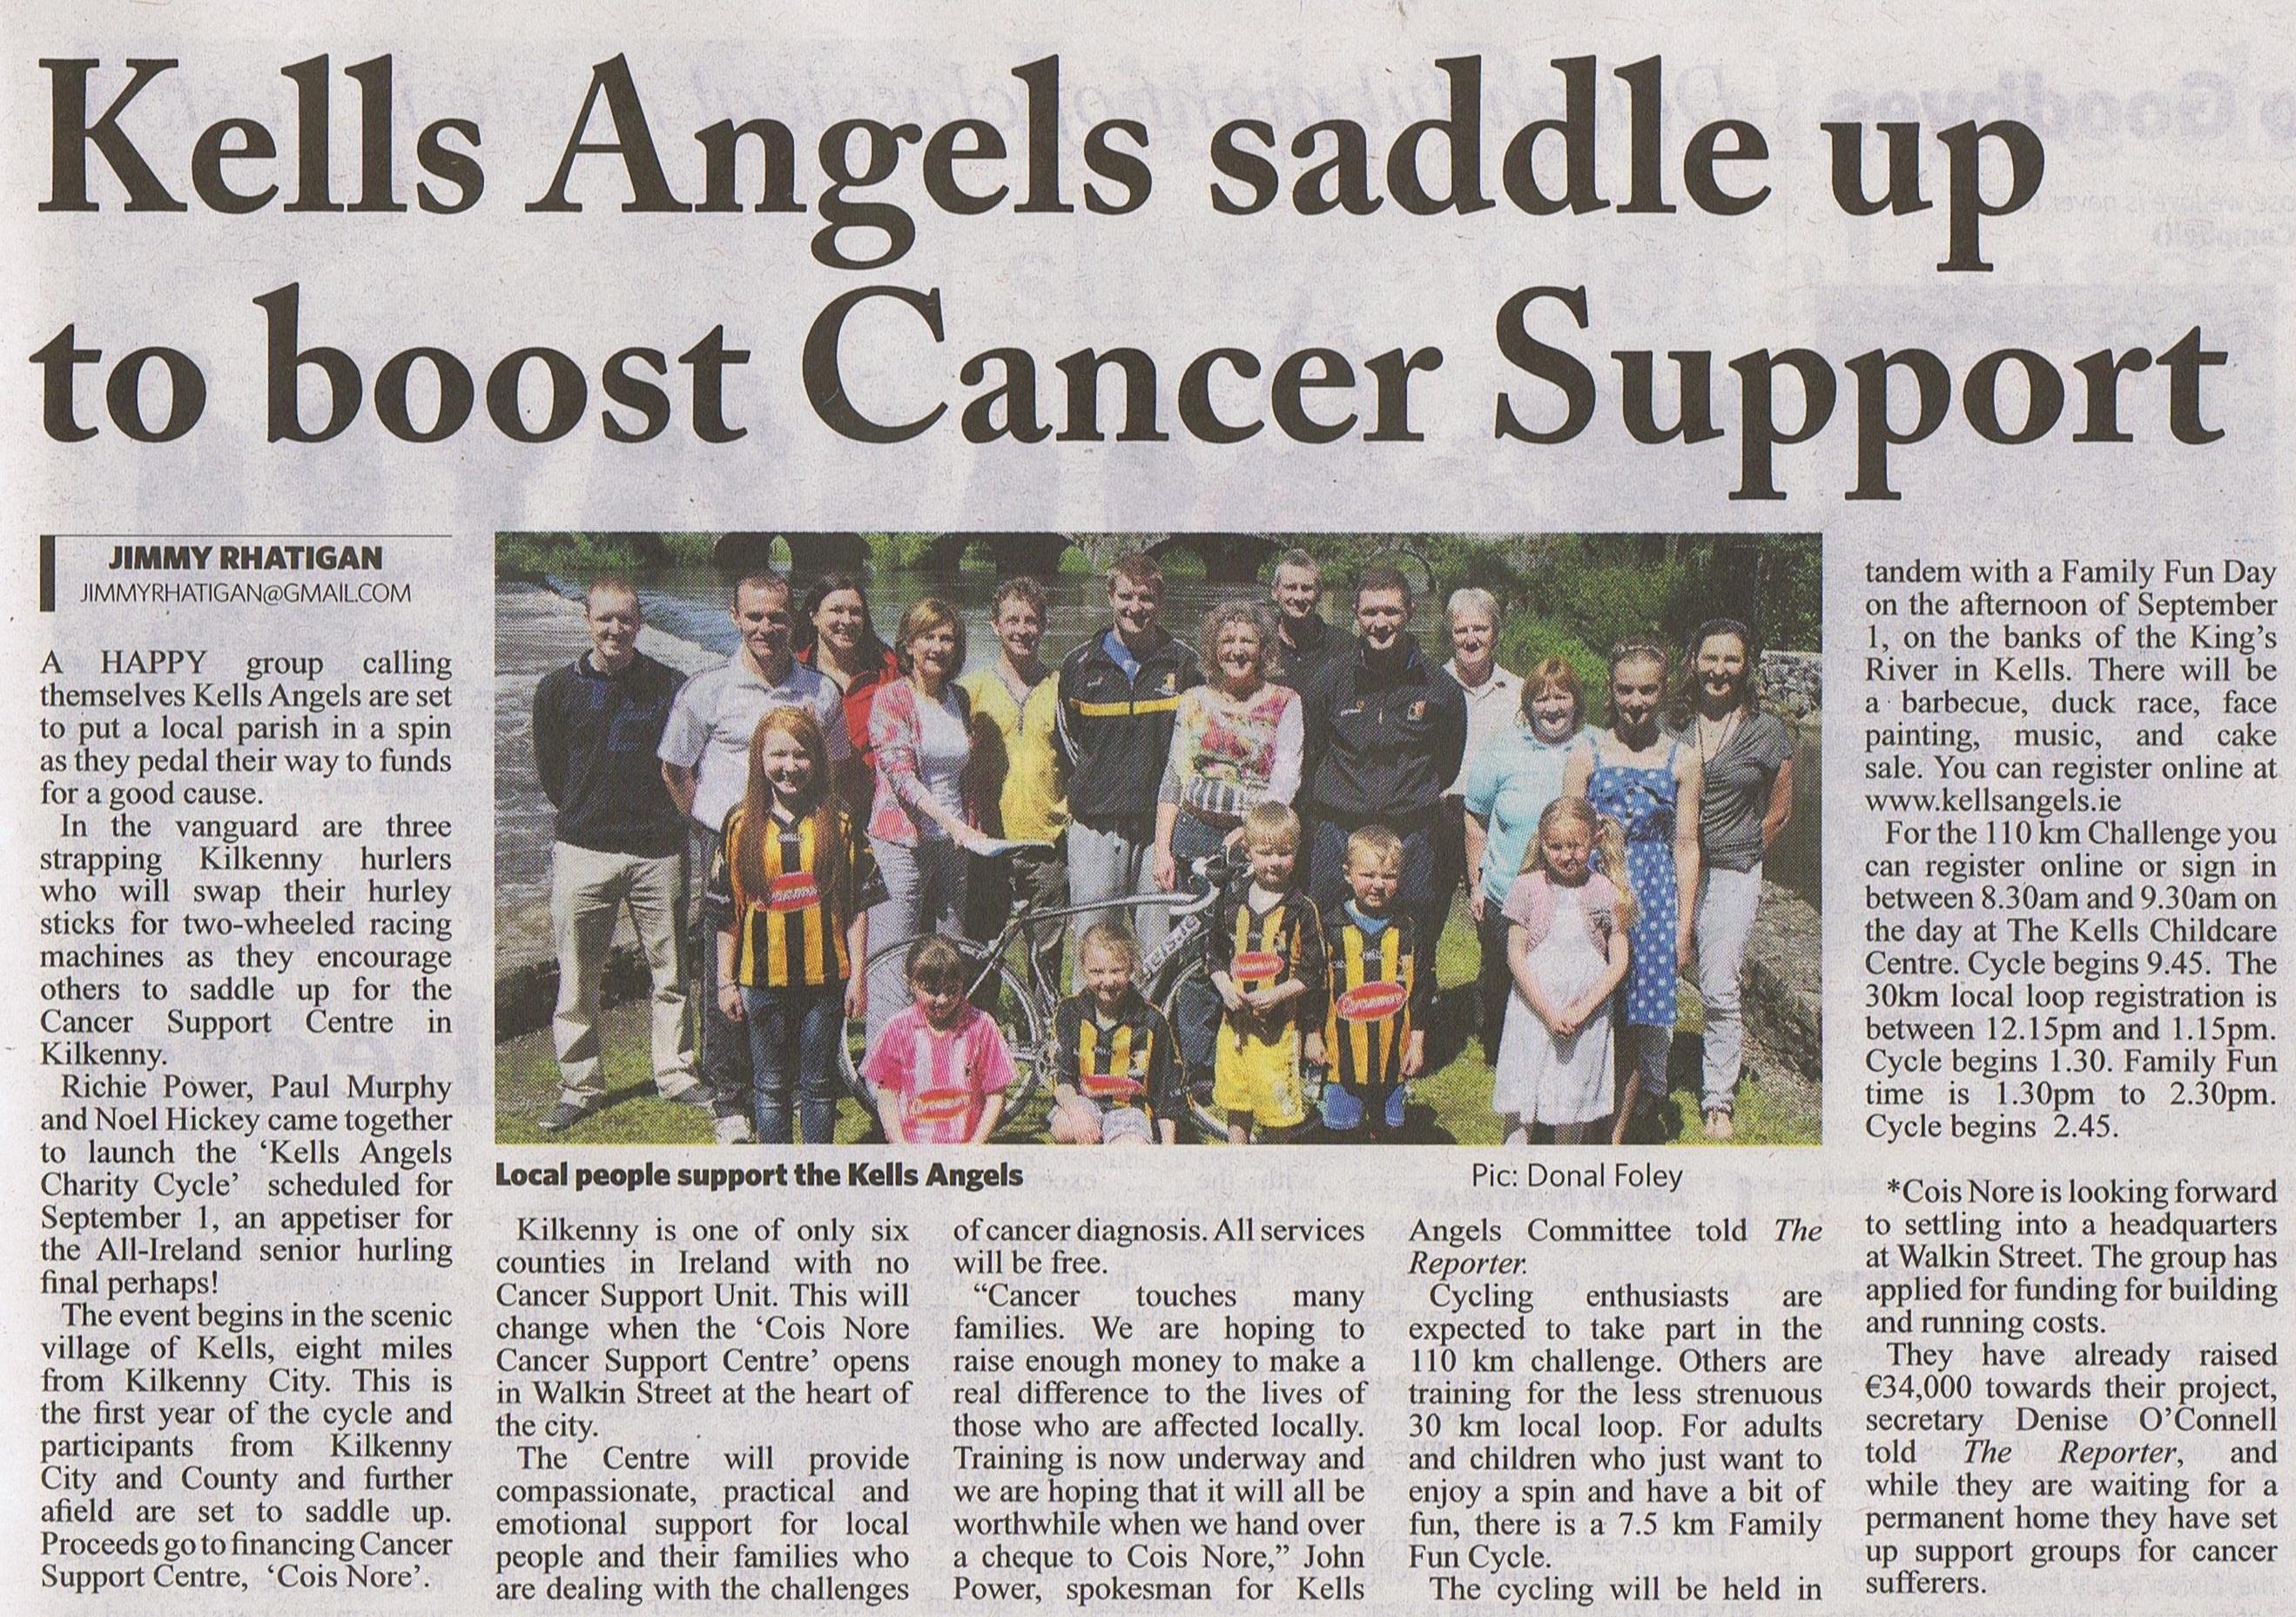 Kells Angels Saddle Up To Boost Cancer Support - Kilkenny Reporter